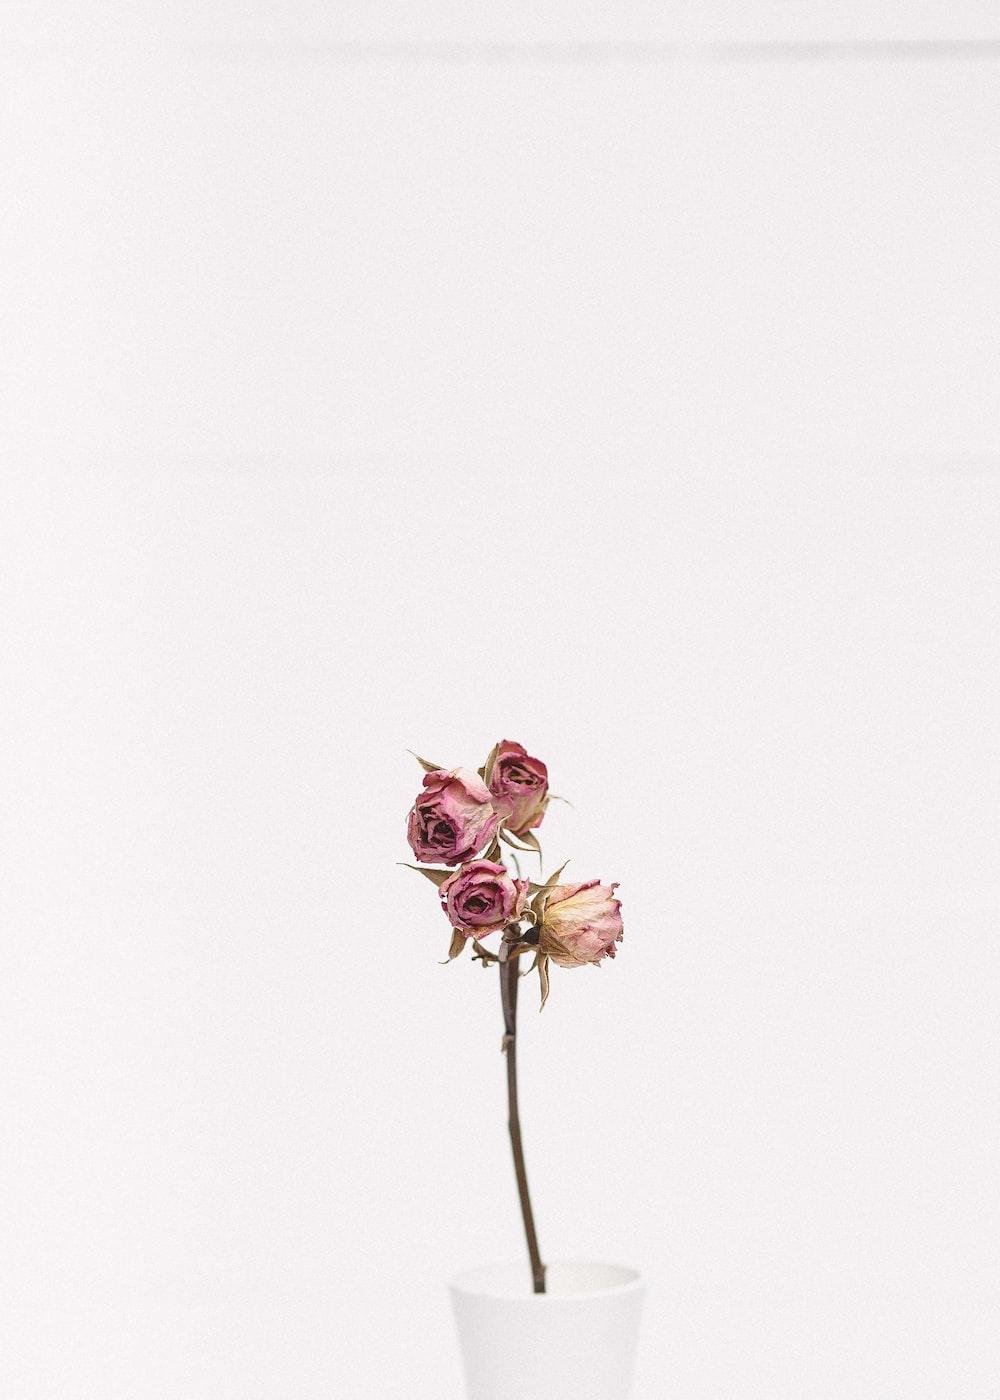 Charming Red Rose Photo By Ivan Jevtic Ivanjevtic On Unsplash